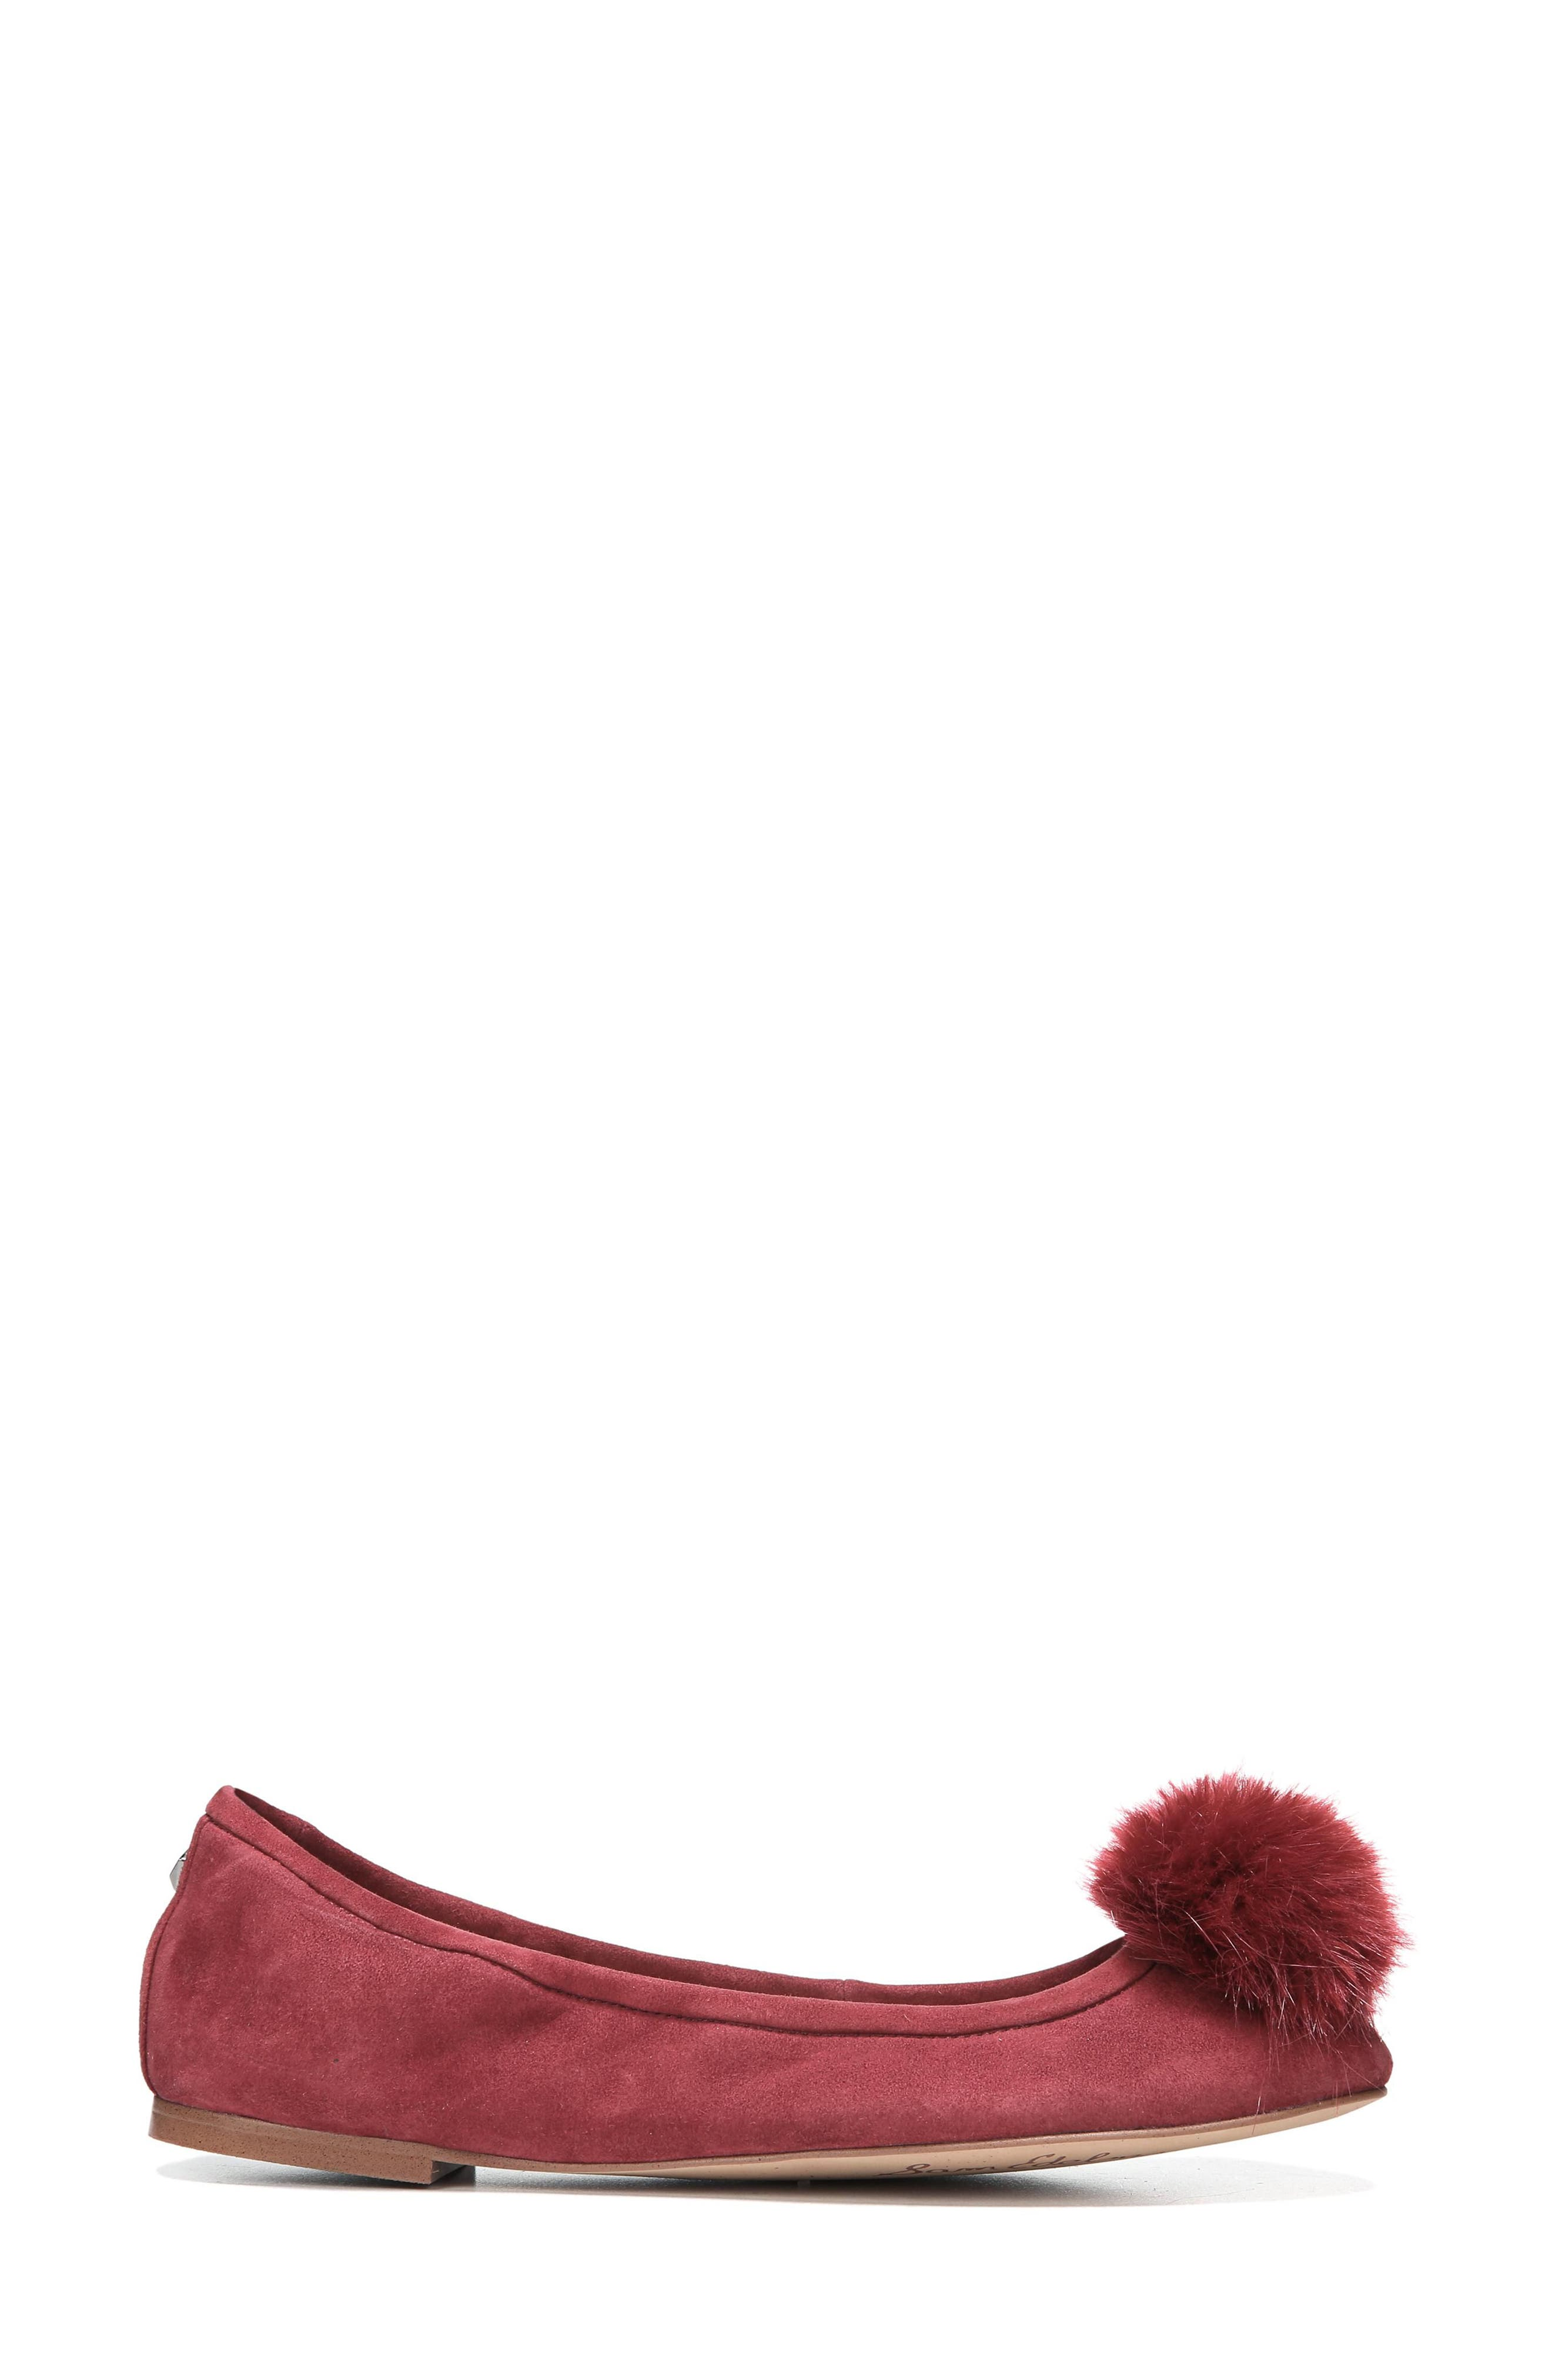 Alternate Image 3  - Sam Edelman Farina Flat with Faux Fur Pompom (Women)